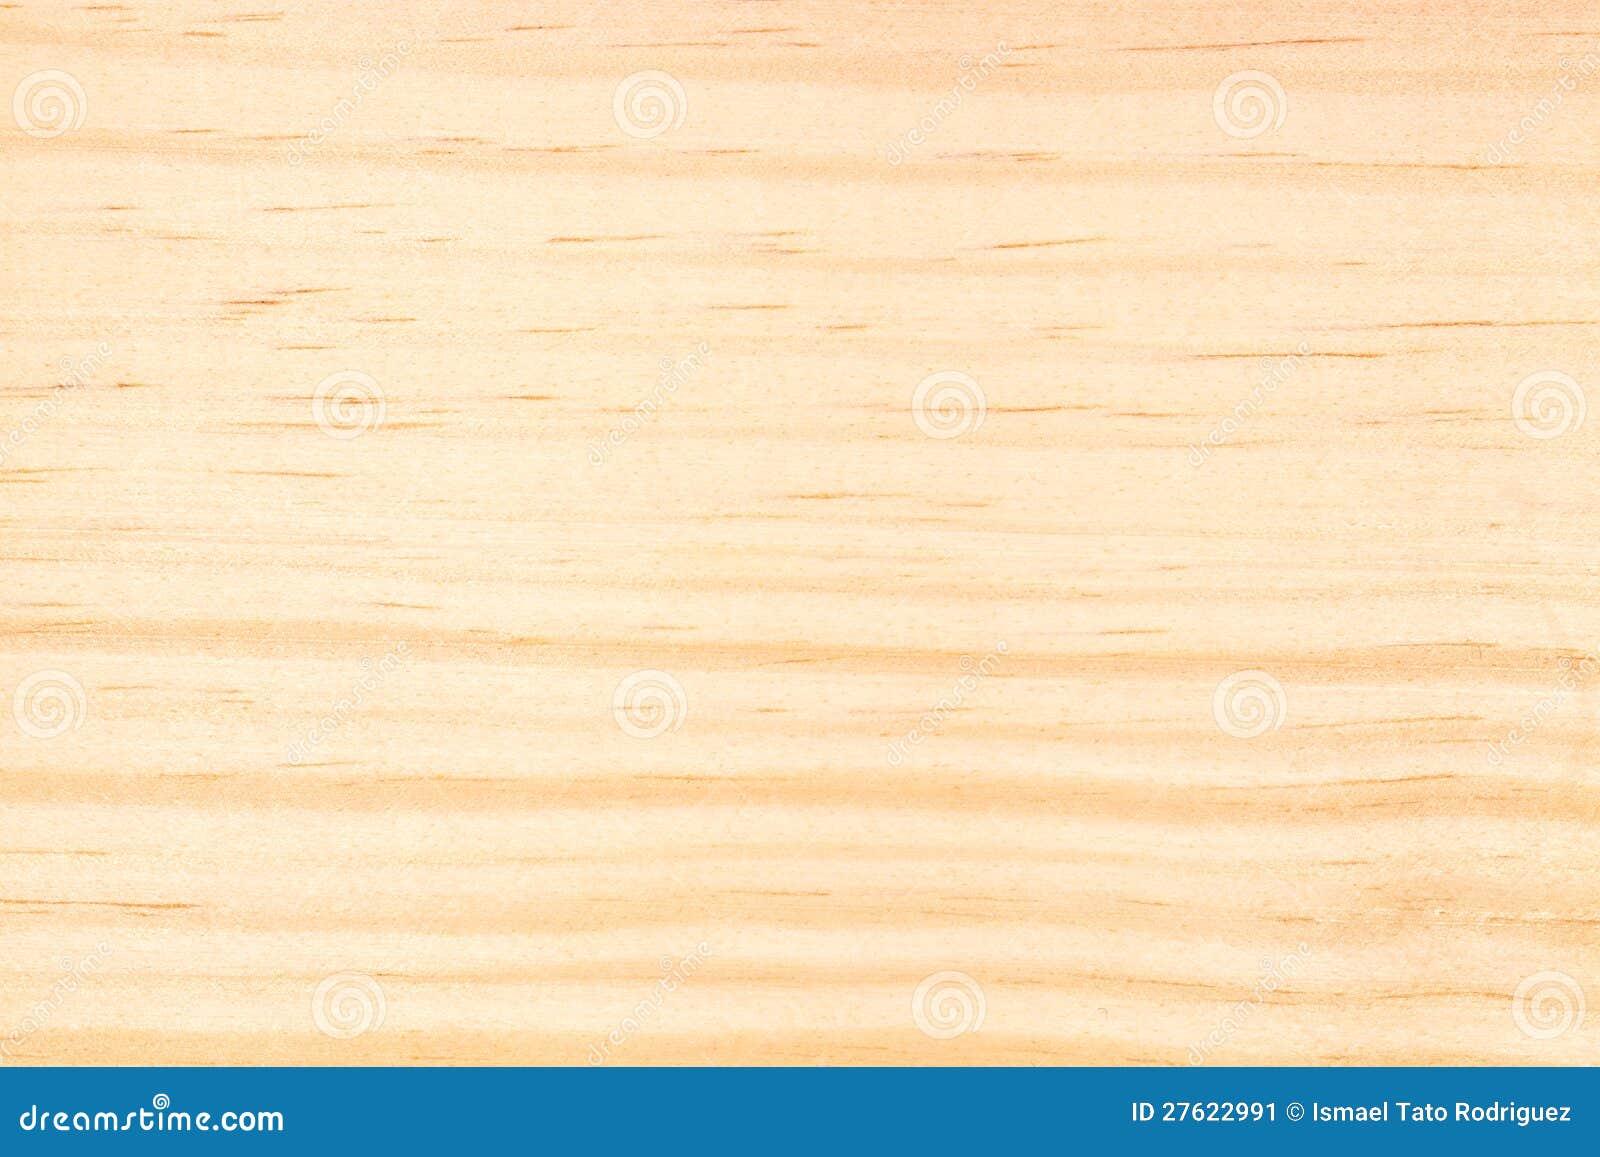 Textura de madera de pino imagen de archivo imagen de horizontal 27622991 - Madera de pino ...